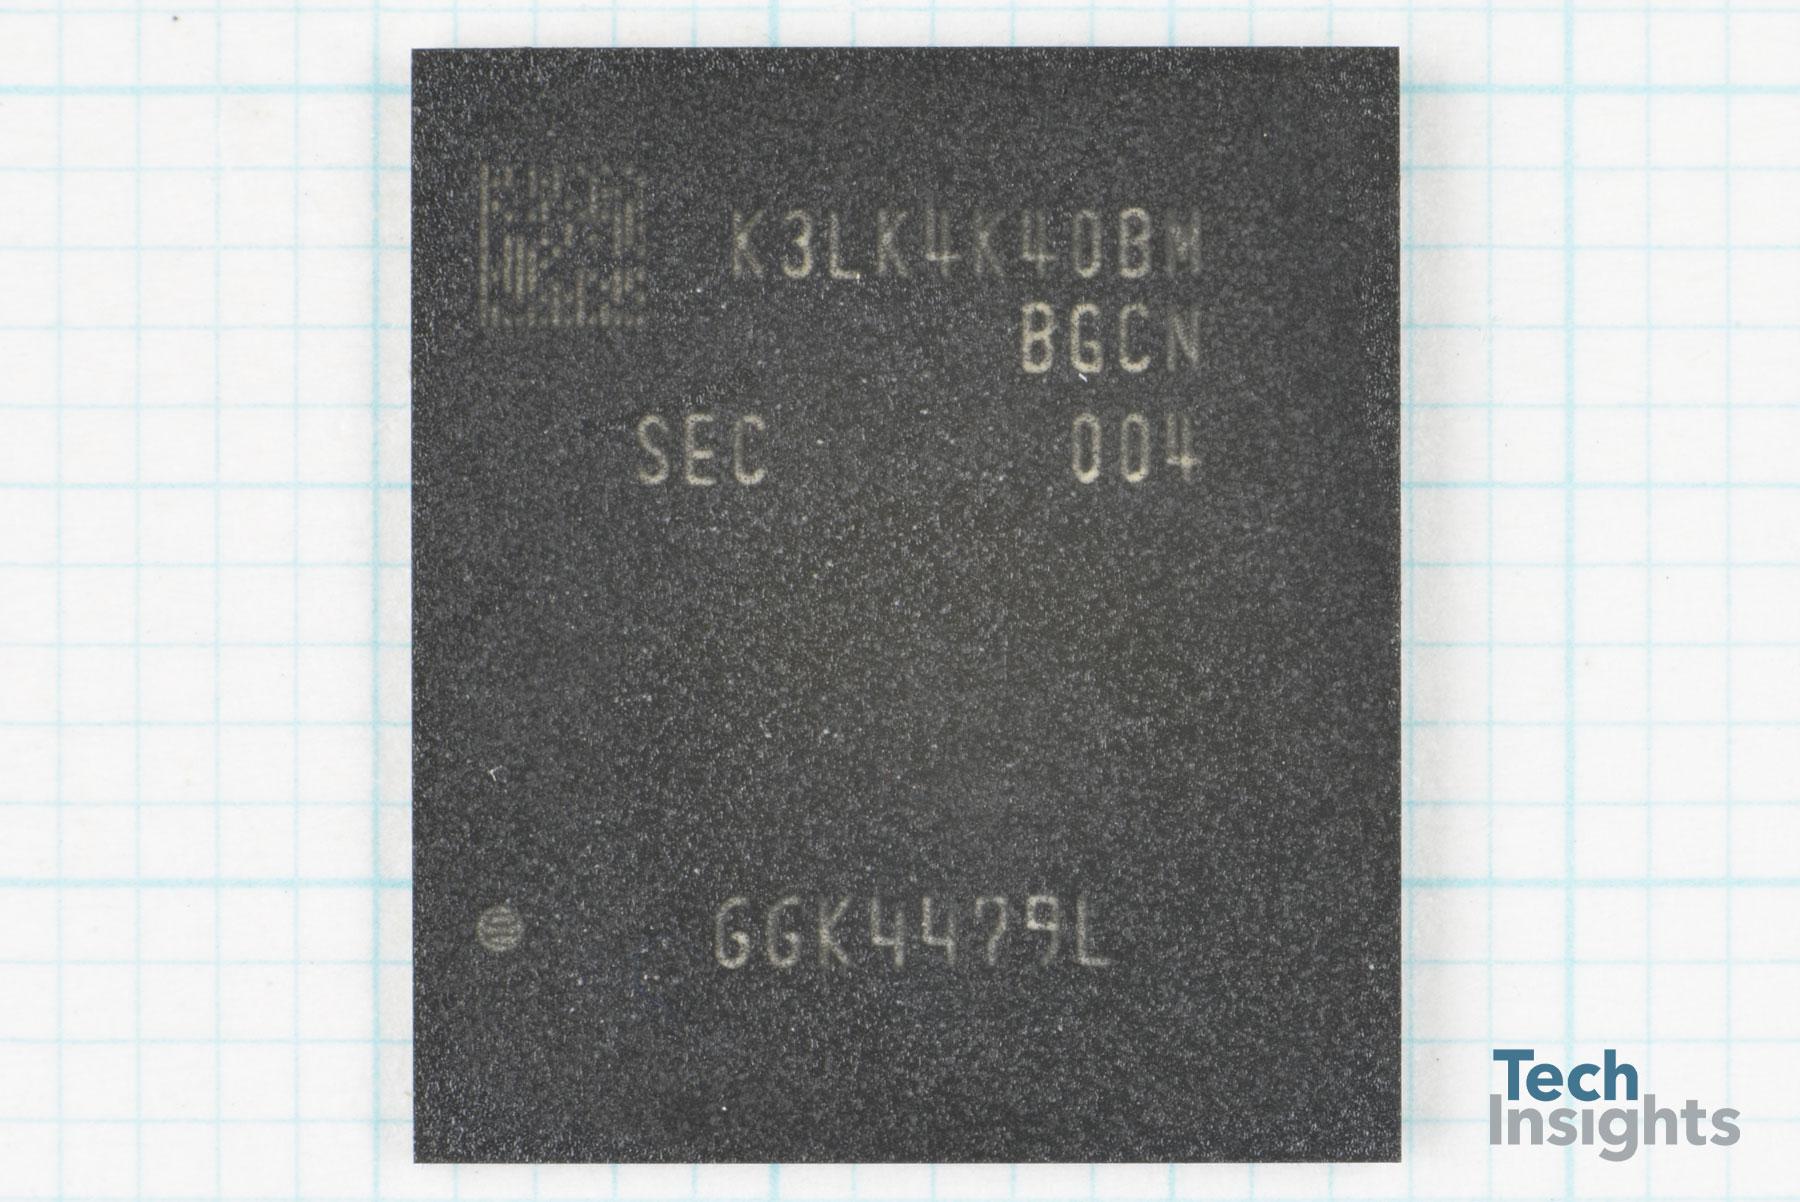 Samsung 12 GB K3LK4K40BM-BGCN